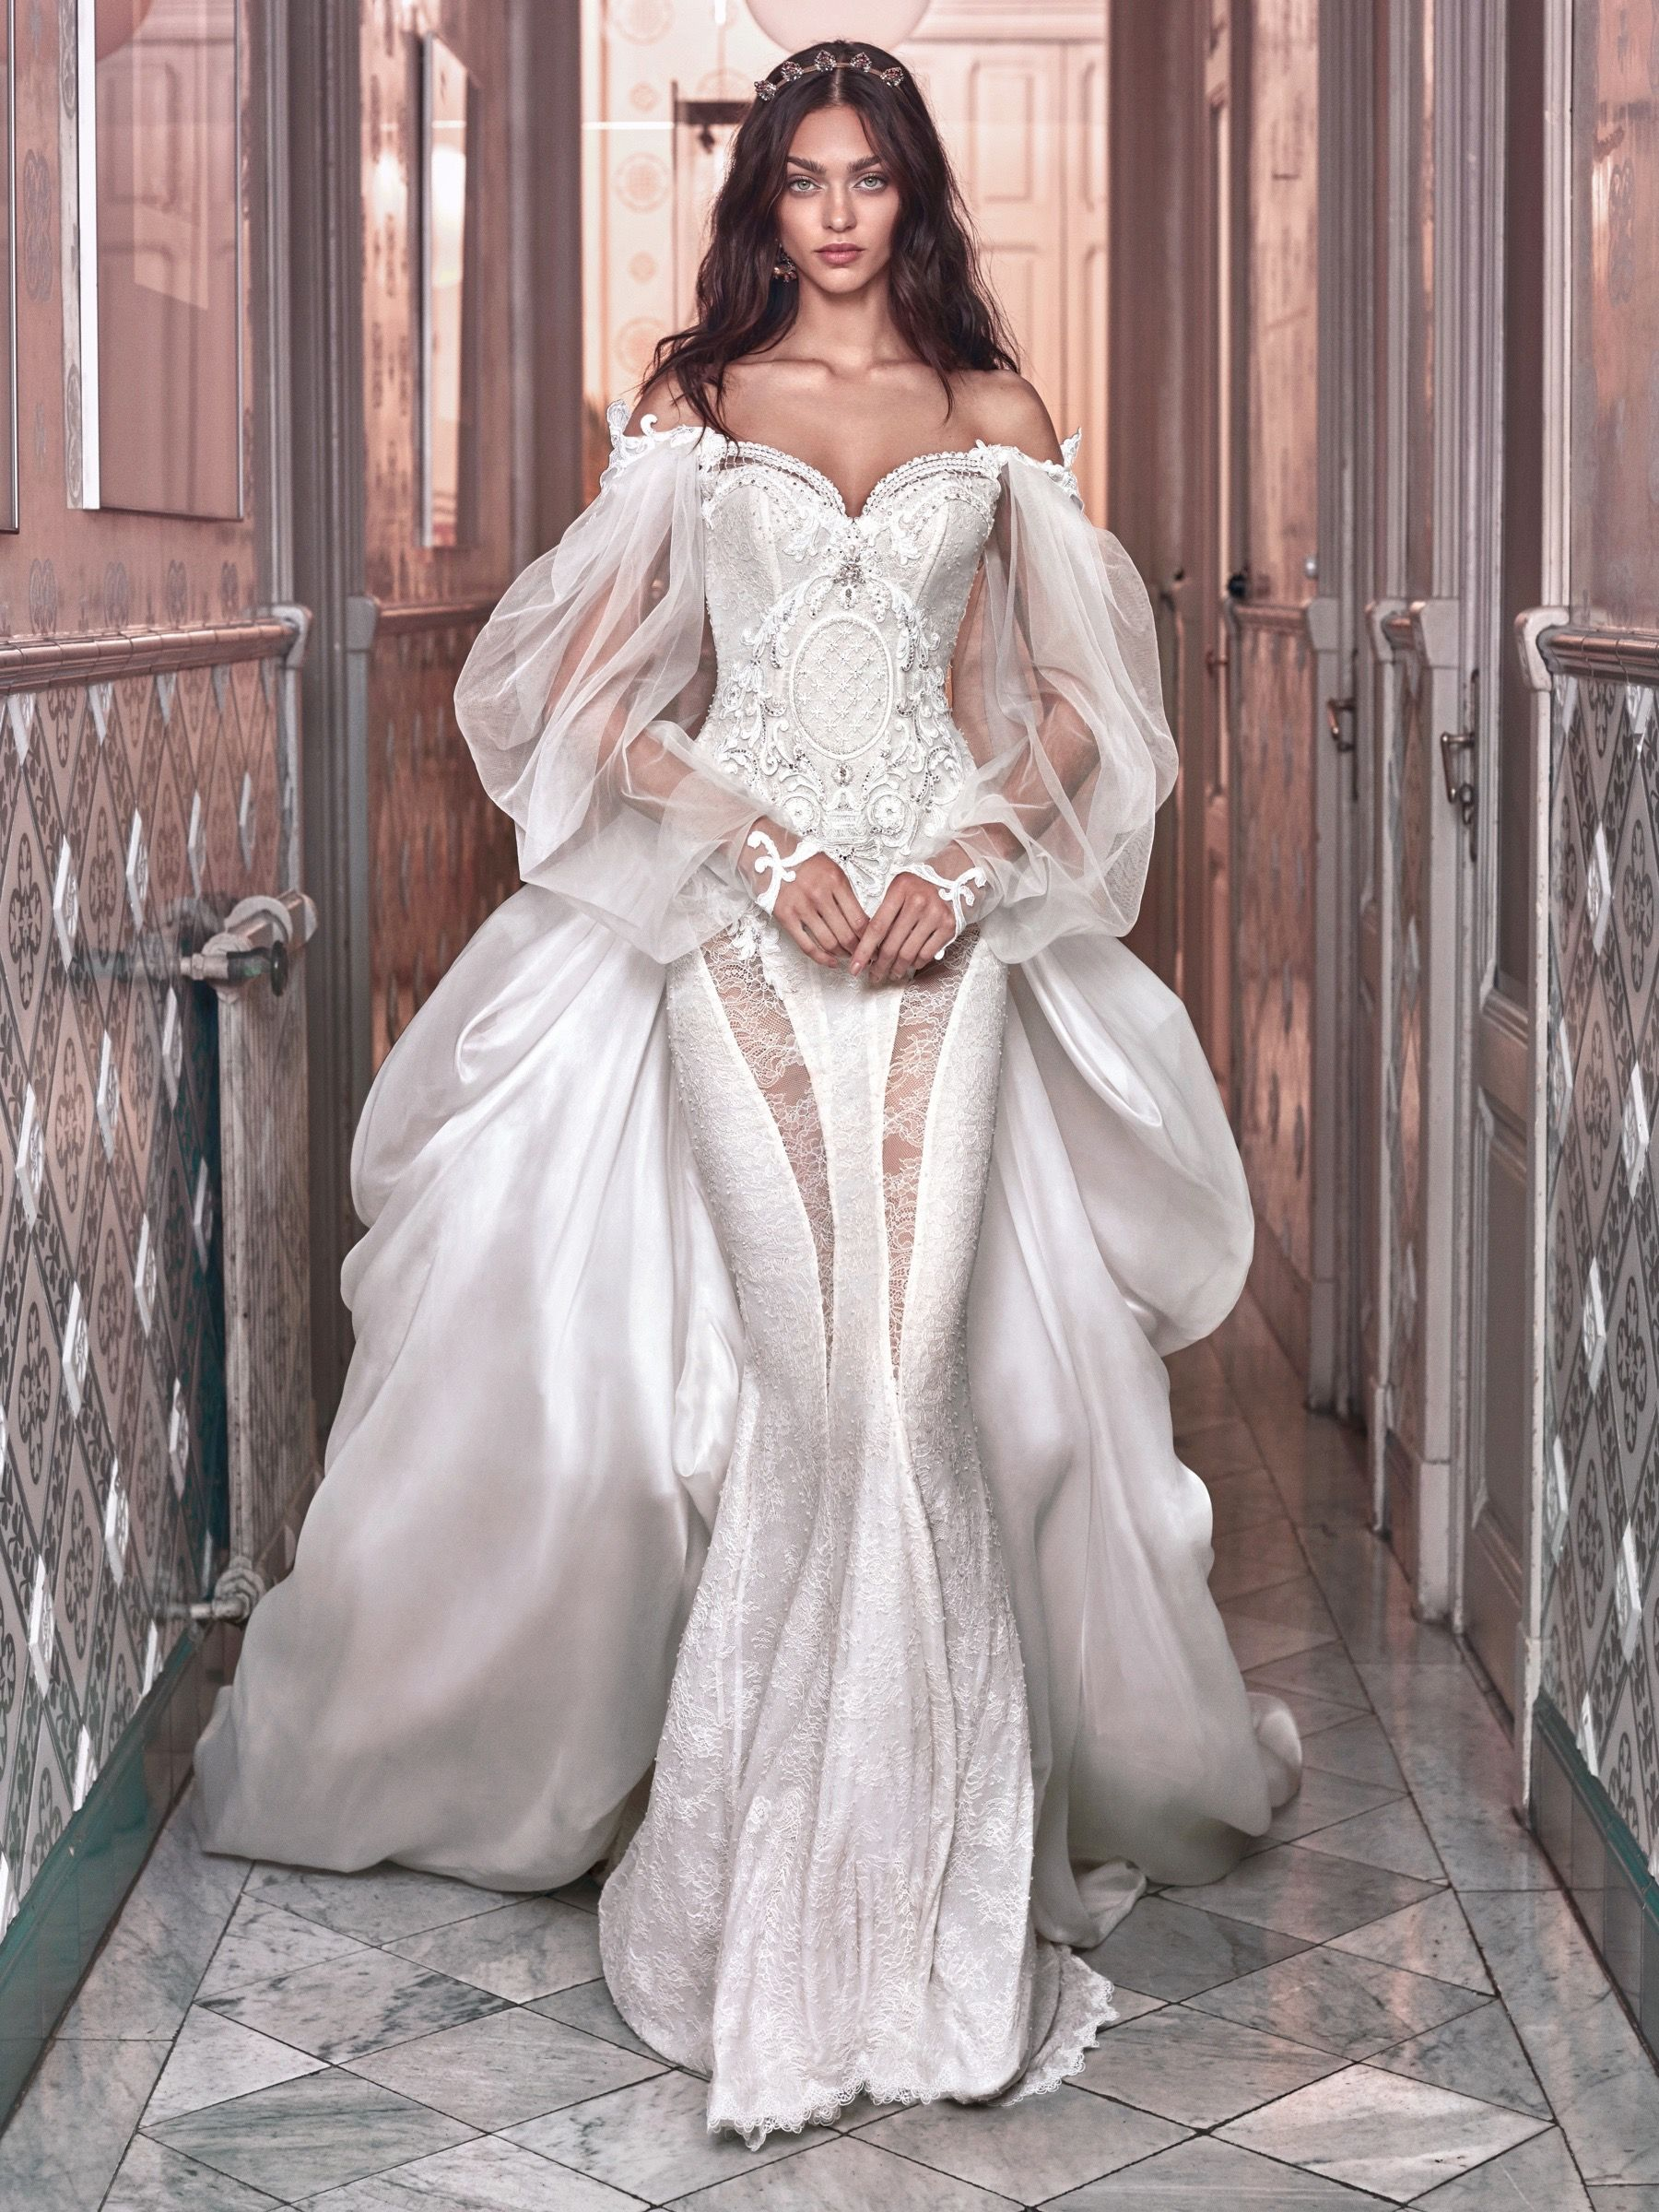 Thelma Victorian Affinity Bridal Dresses Galia Lahav Victorian Wedding Dress Galia Lahav Wedding Dress Bridal Dresses [ 2400 x 1800 Pixel ]